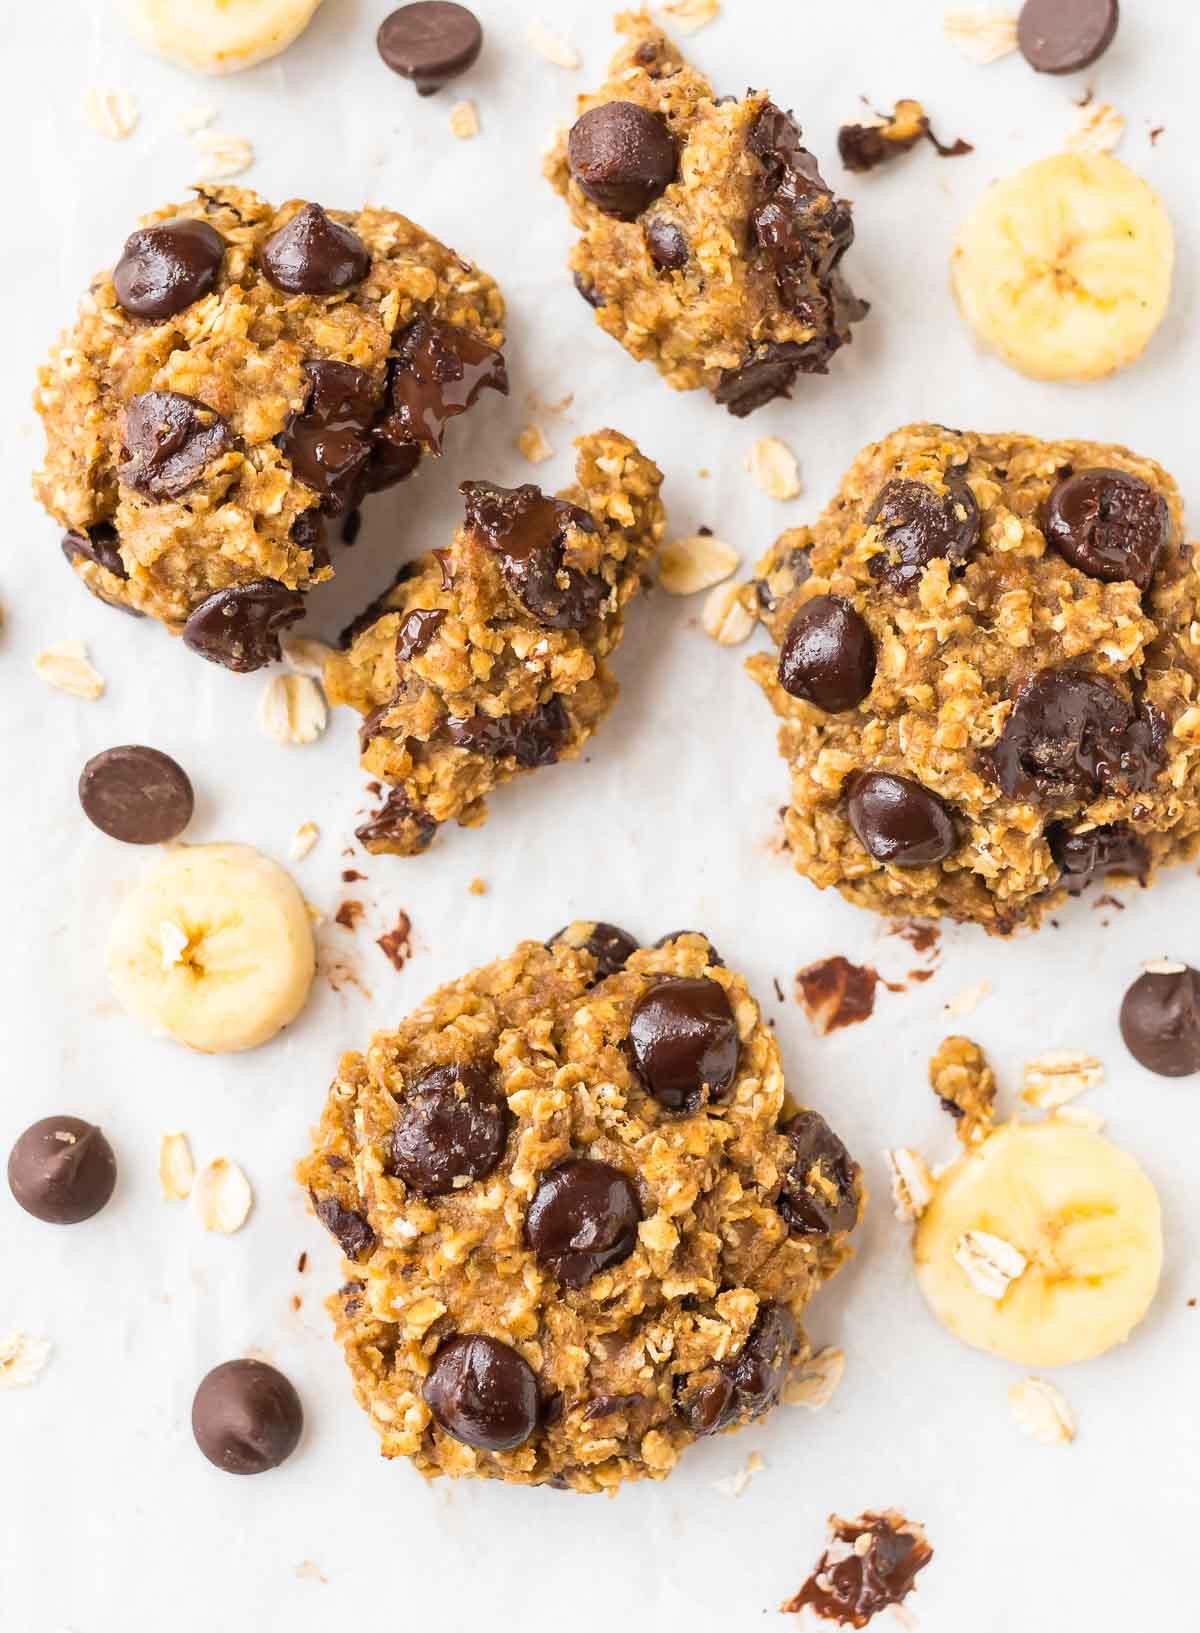 Oatmeal Banana Cookies Healthy  Healthy Banana Oatmeal Cookies with Chocolate Chips